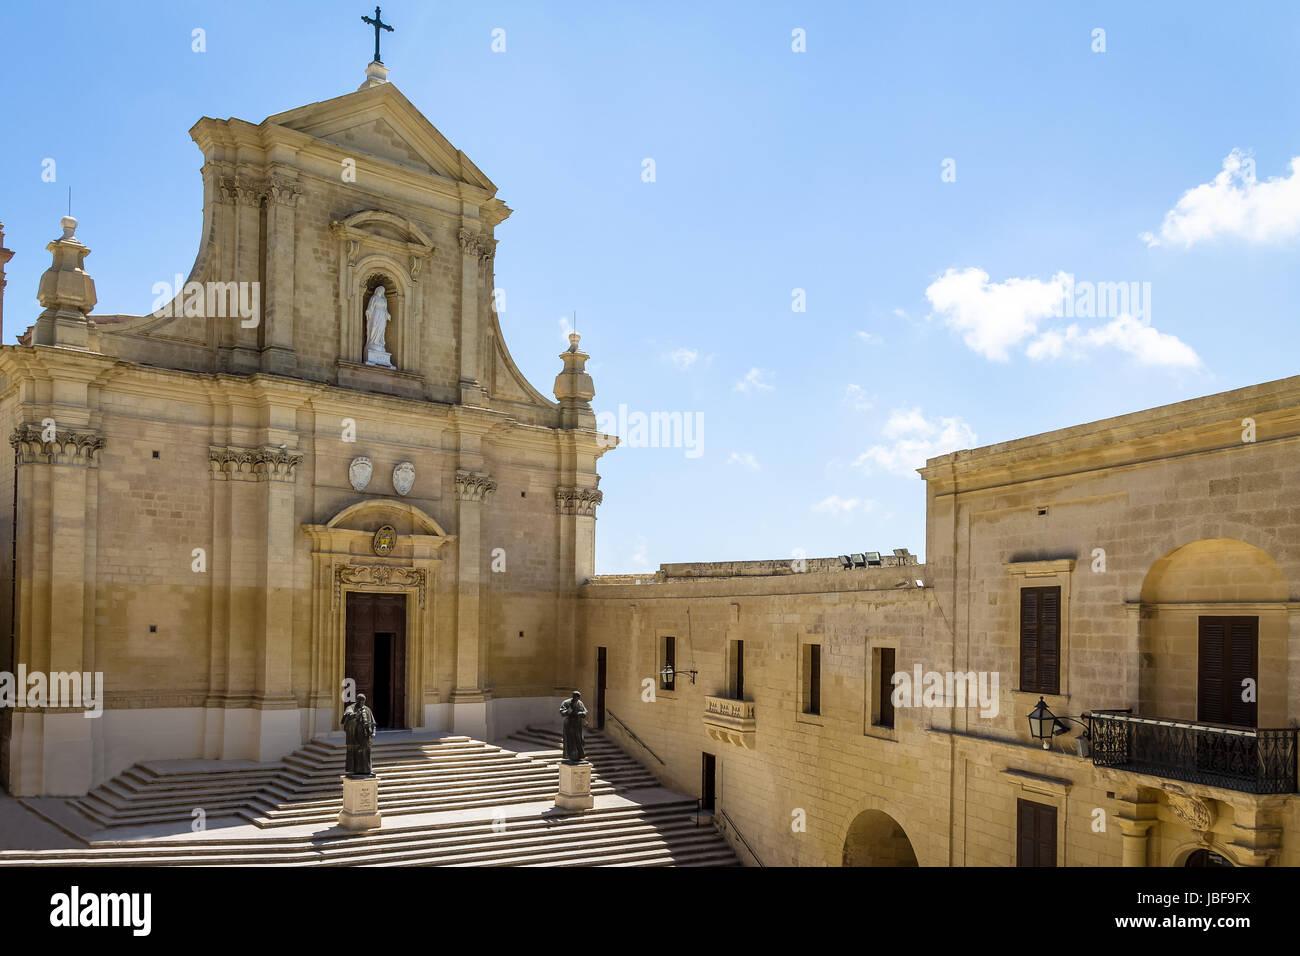 The Gozo Cathedral inside the Citadel of Victoria (former Rabat) - Victoria, Gozo, Malta - Stock Image